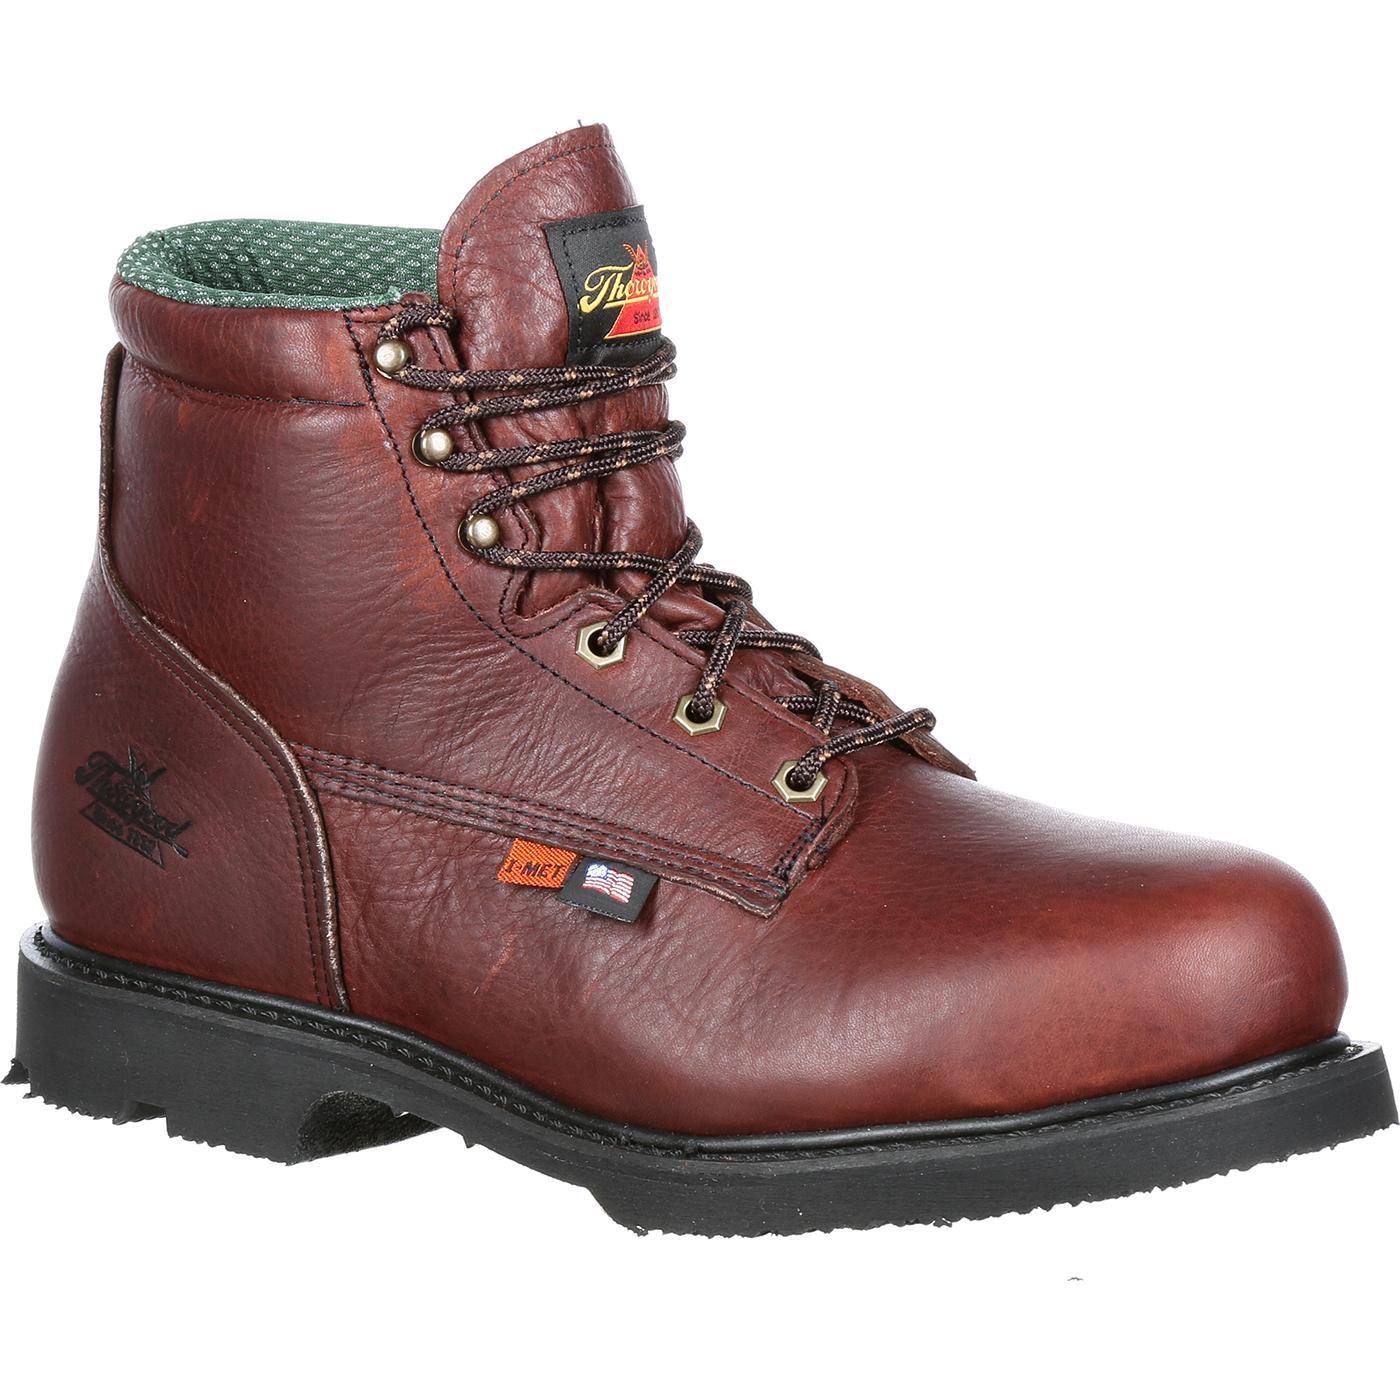 457c1a17f89 Thorogood Unisex Steel Toe Internal Met Guard Work Boot